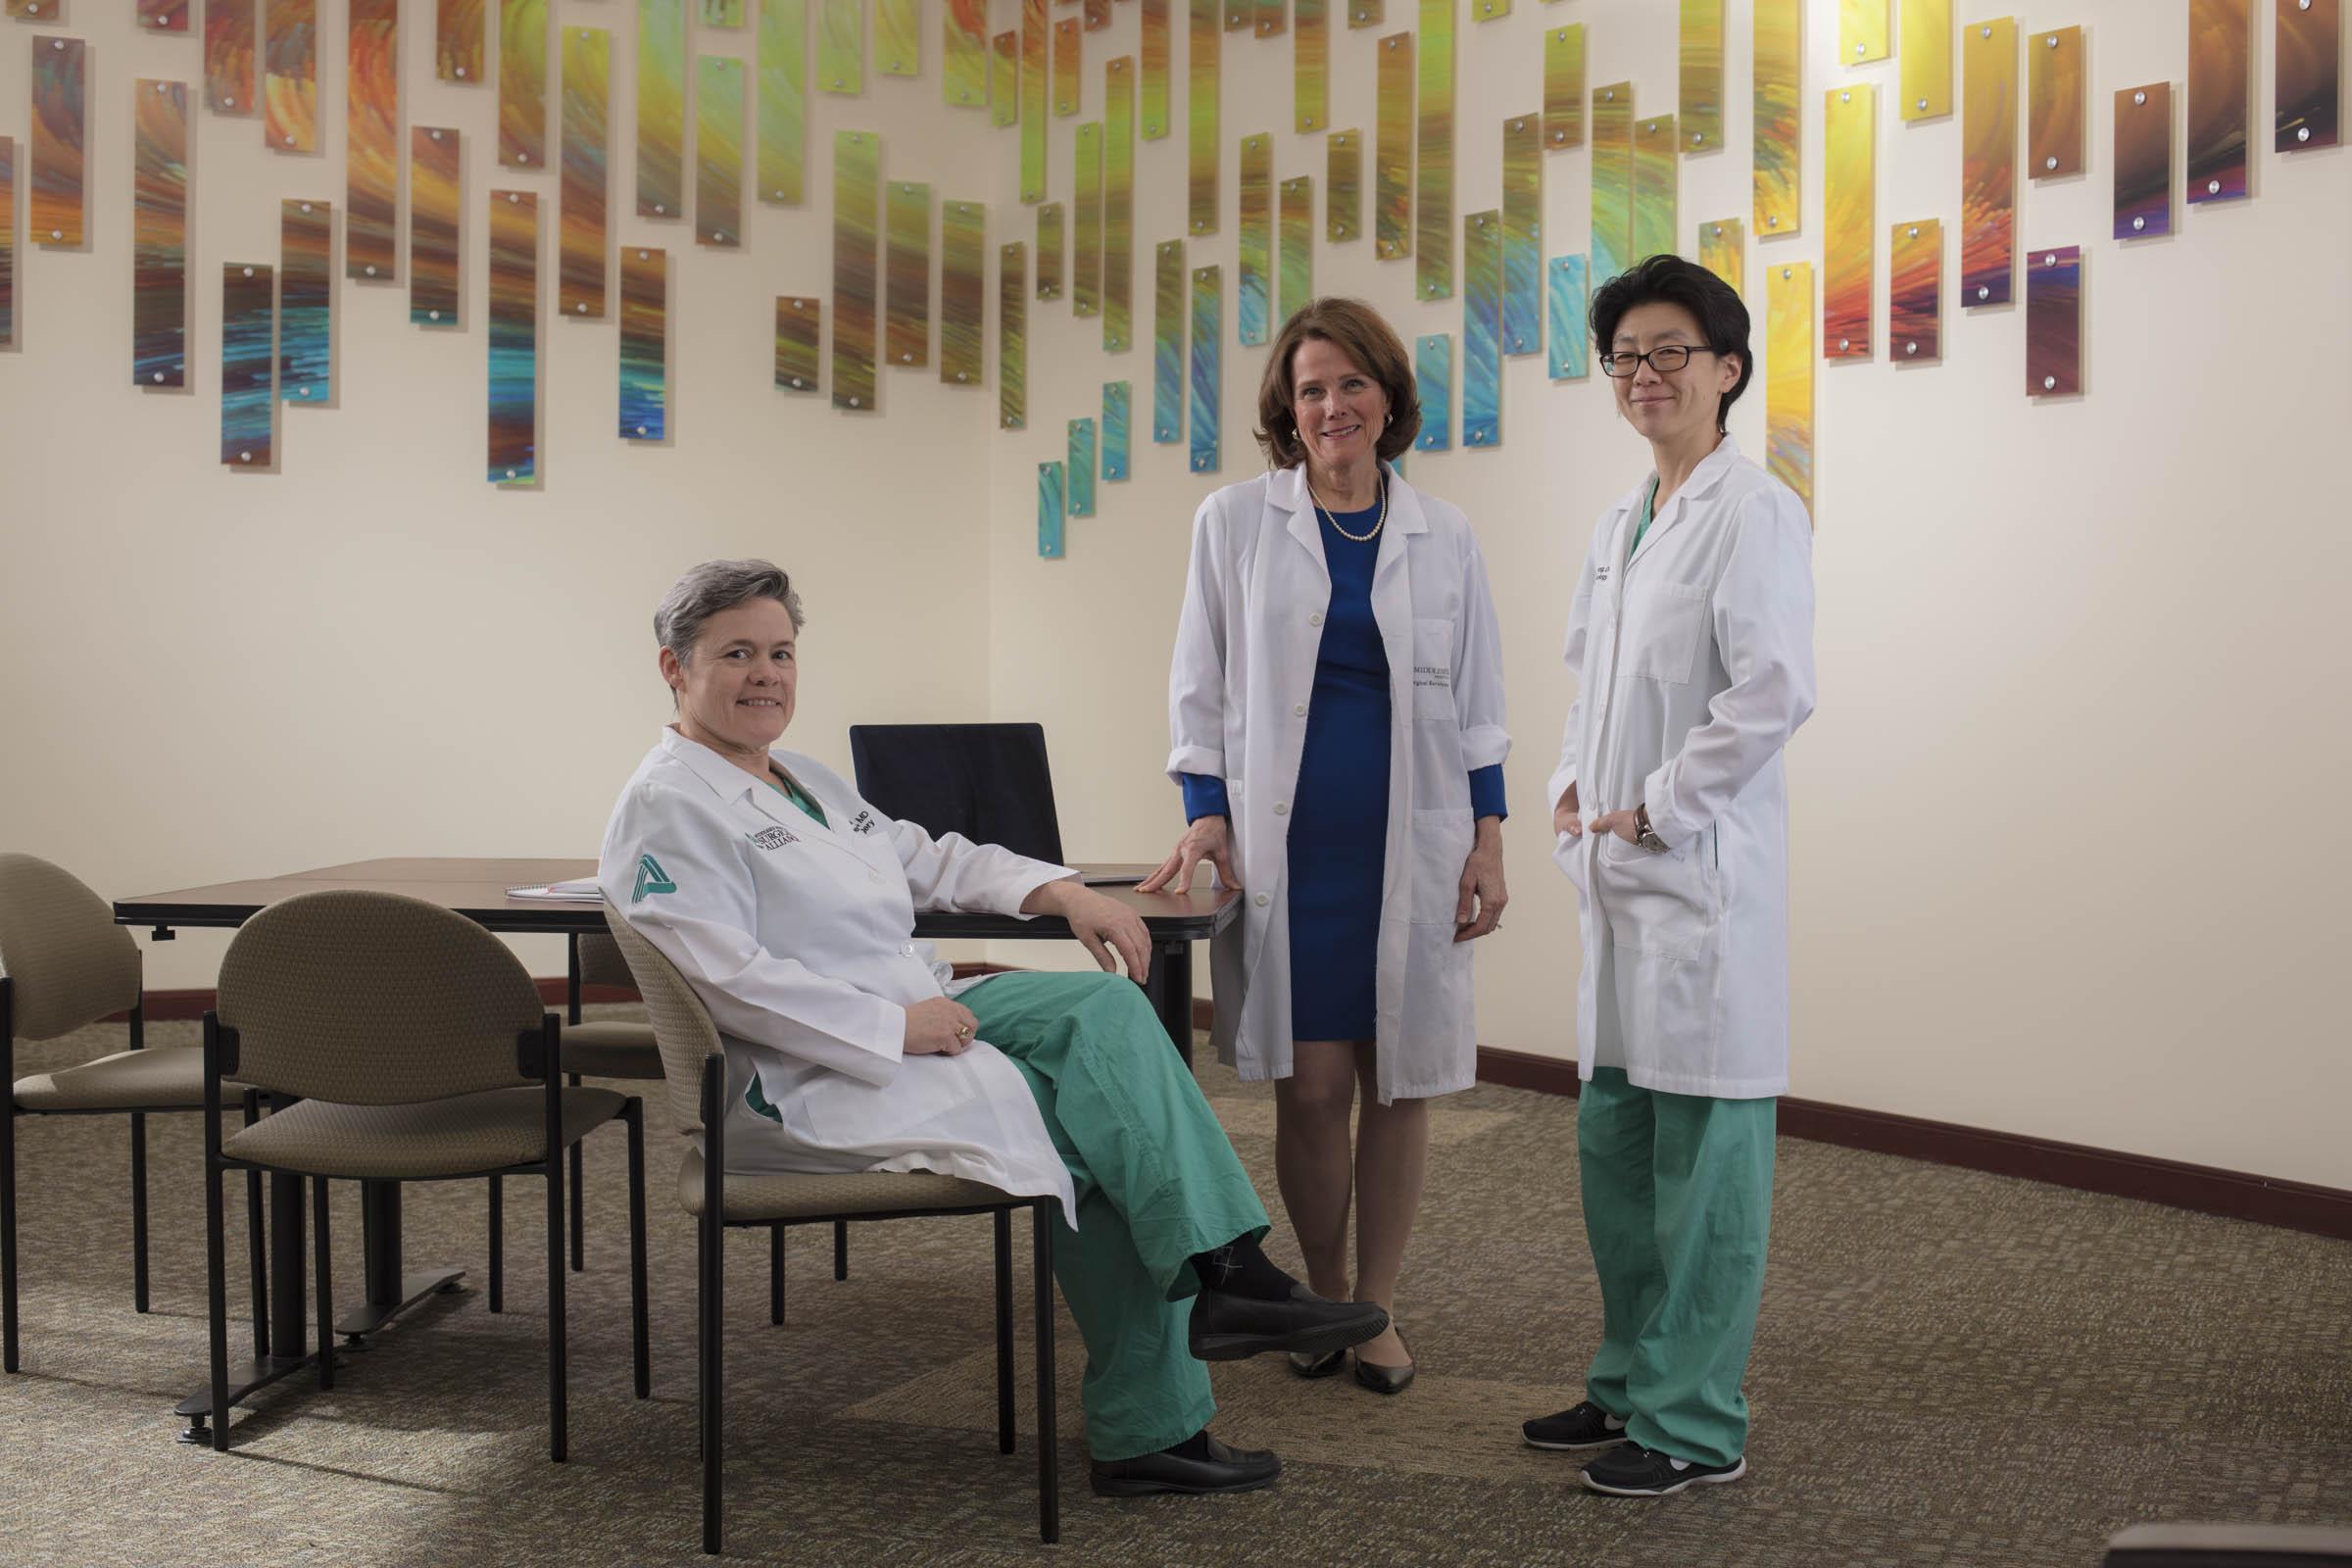 MDSX CCTR Surgeons -1048.jpg